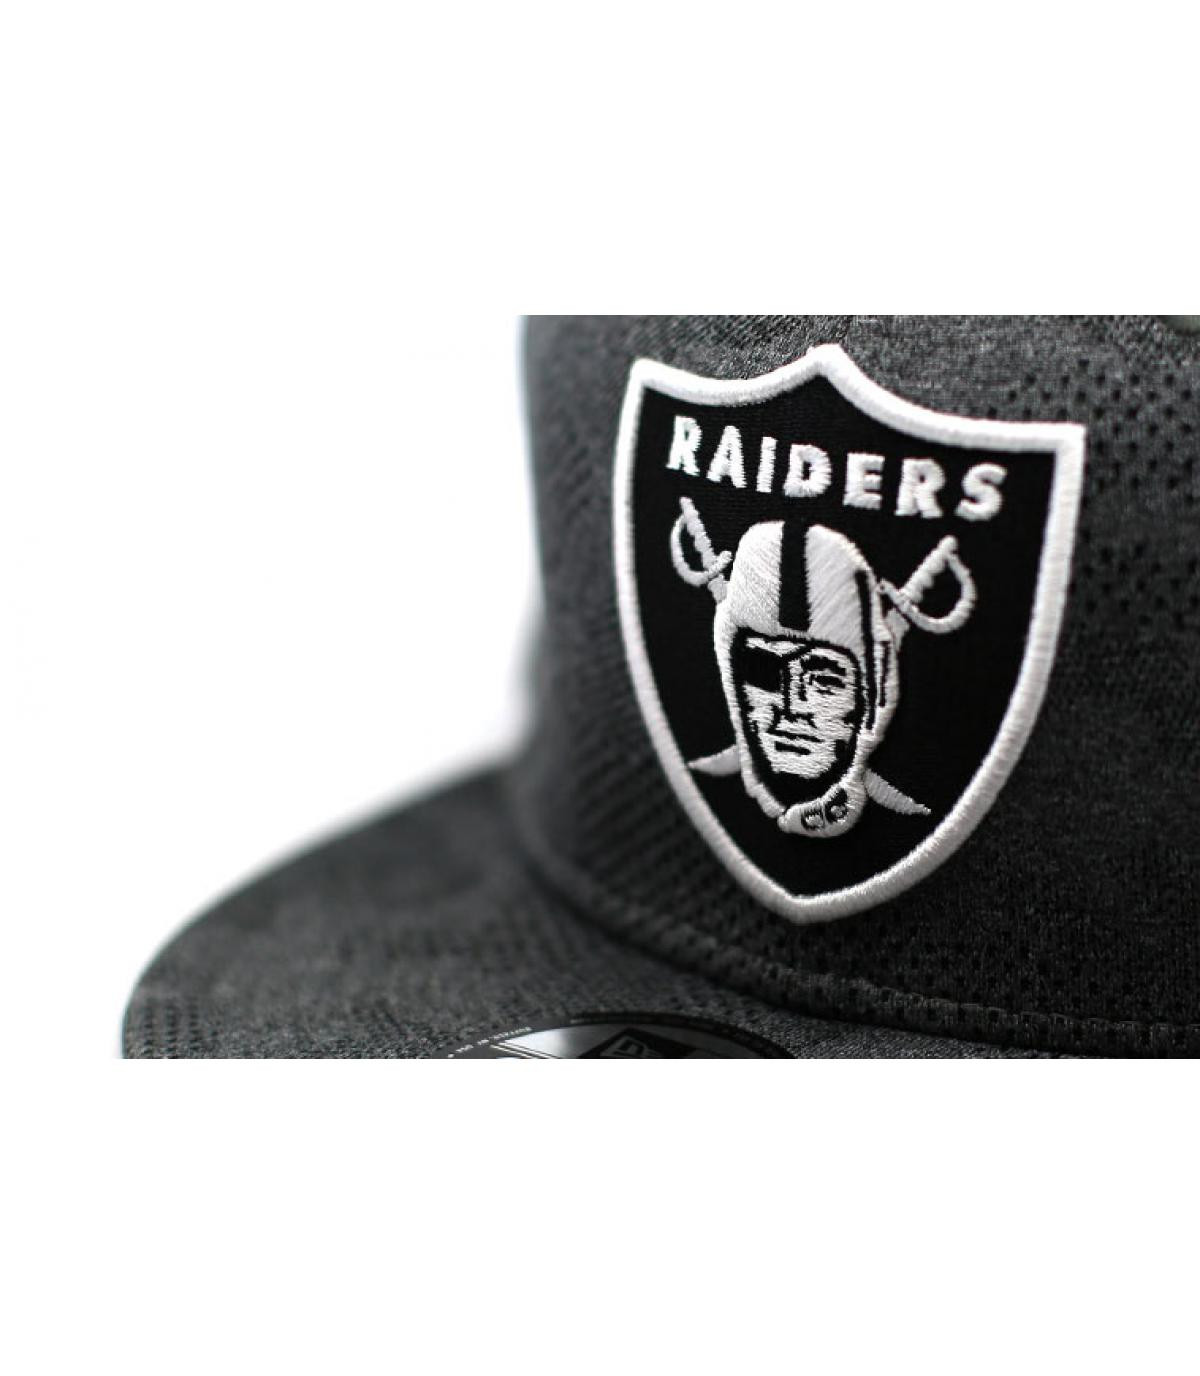 Detalles Engineered Plus Raiders 950 gray black imagen 3